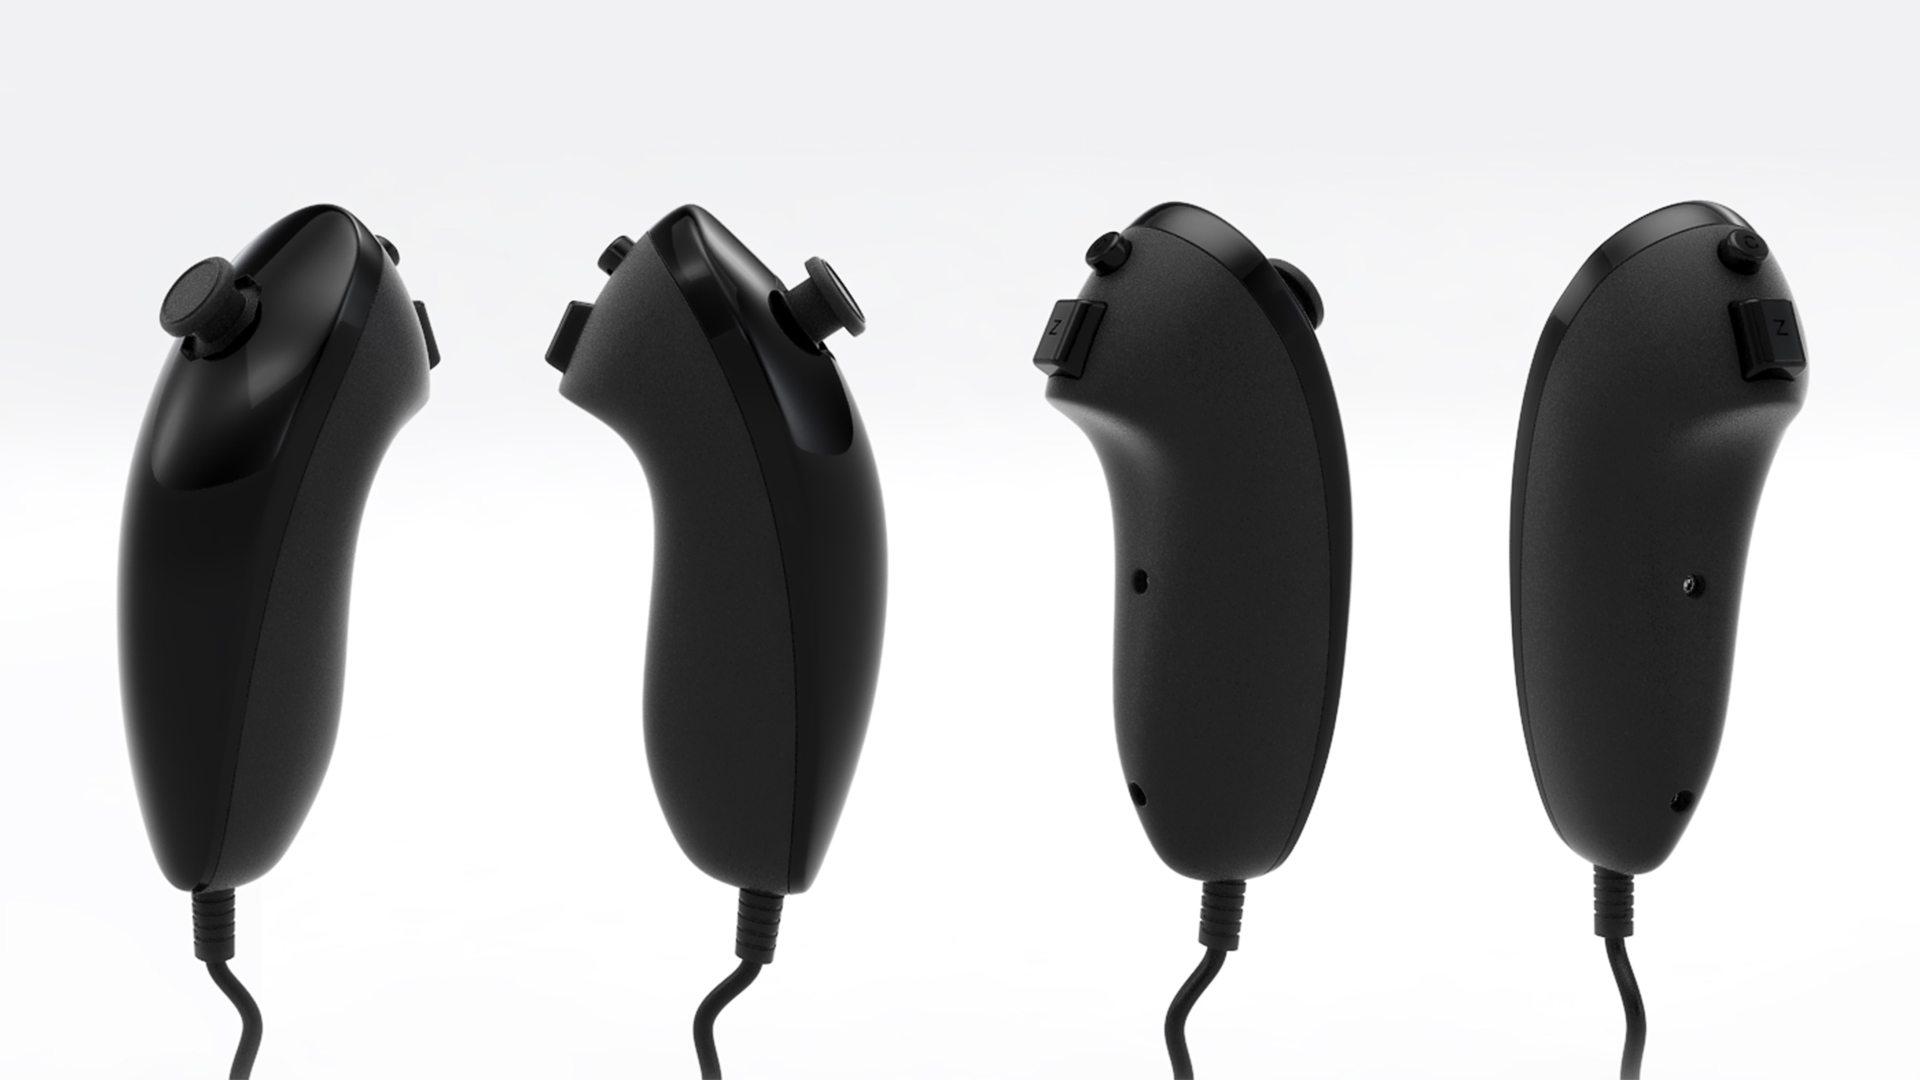 Wii Nunchuk Controller